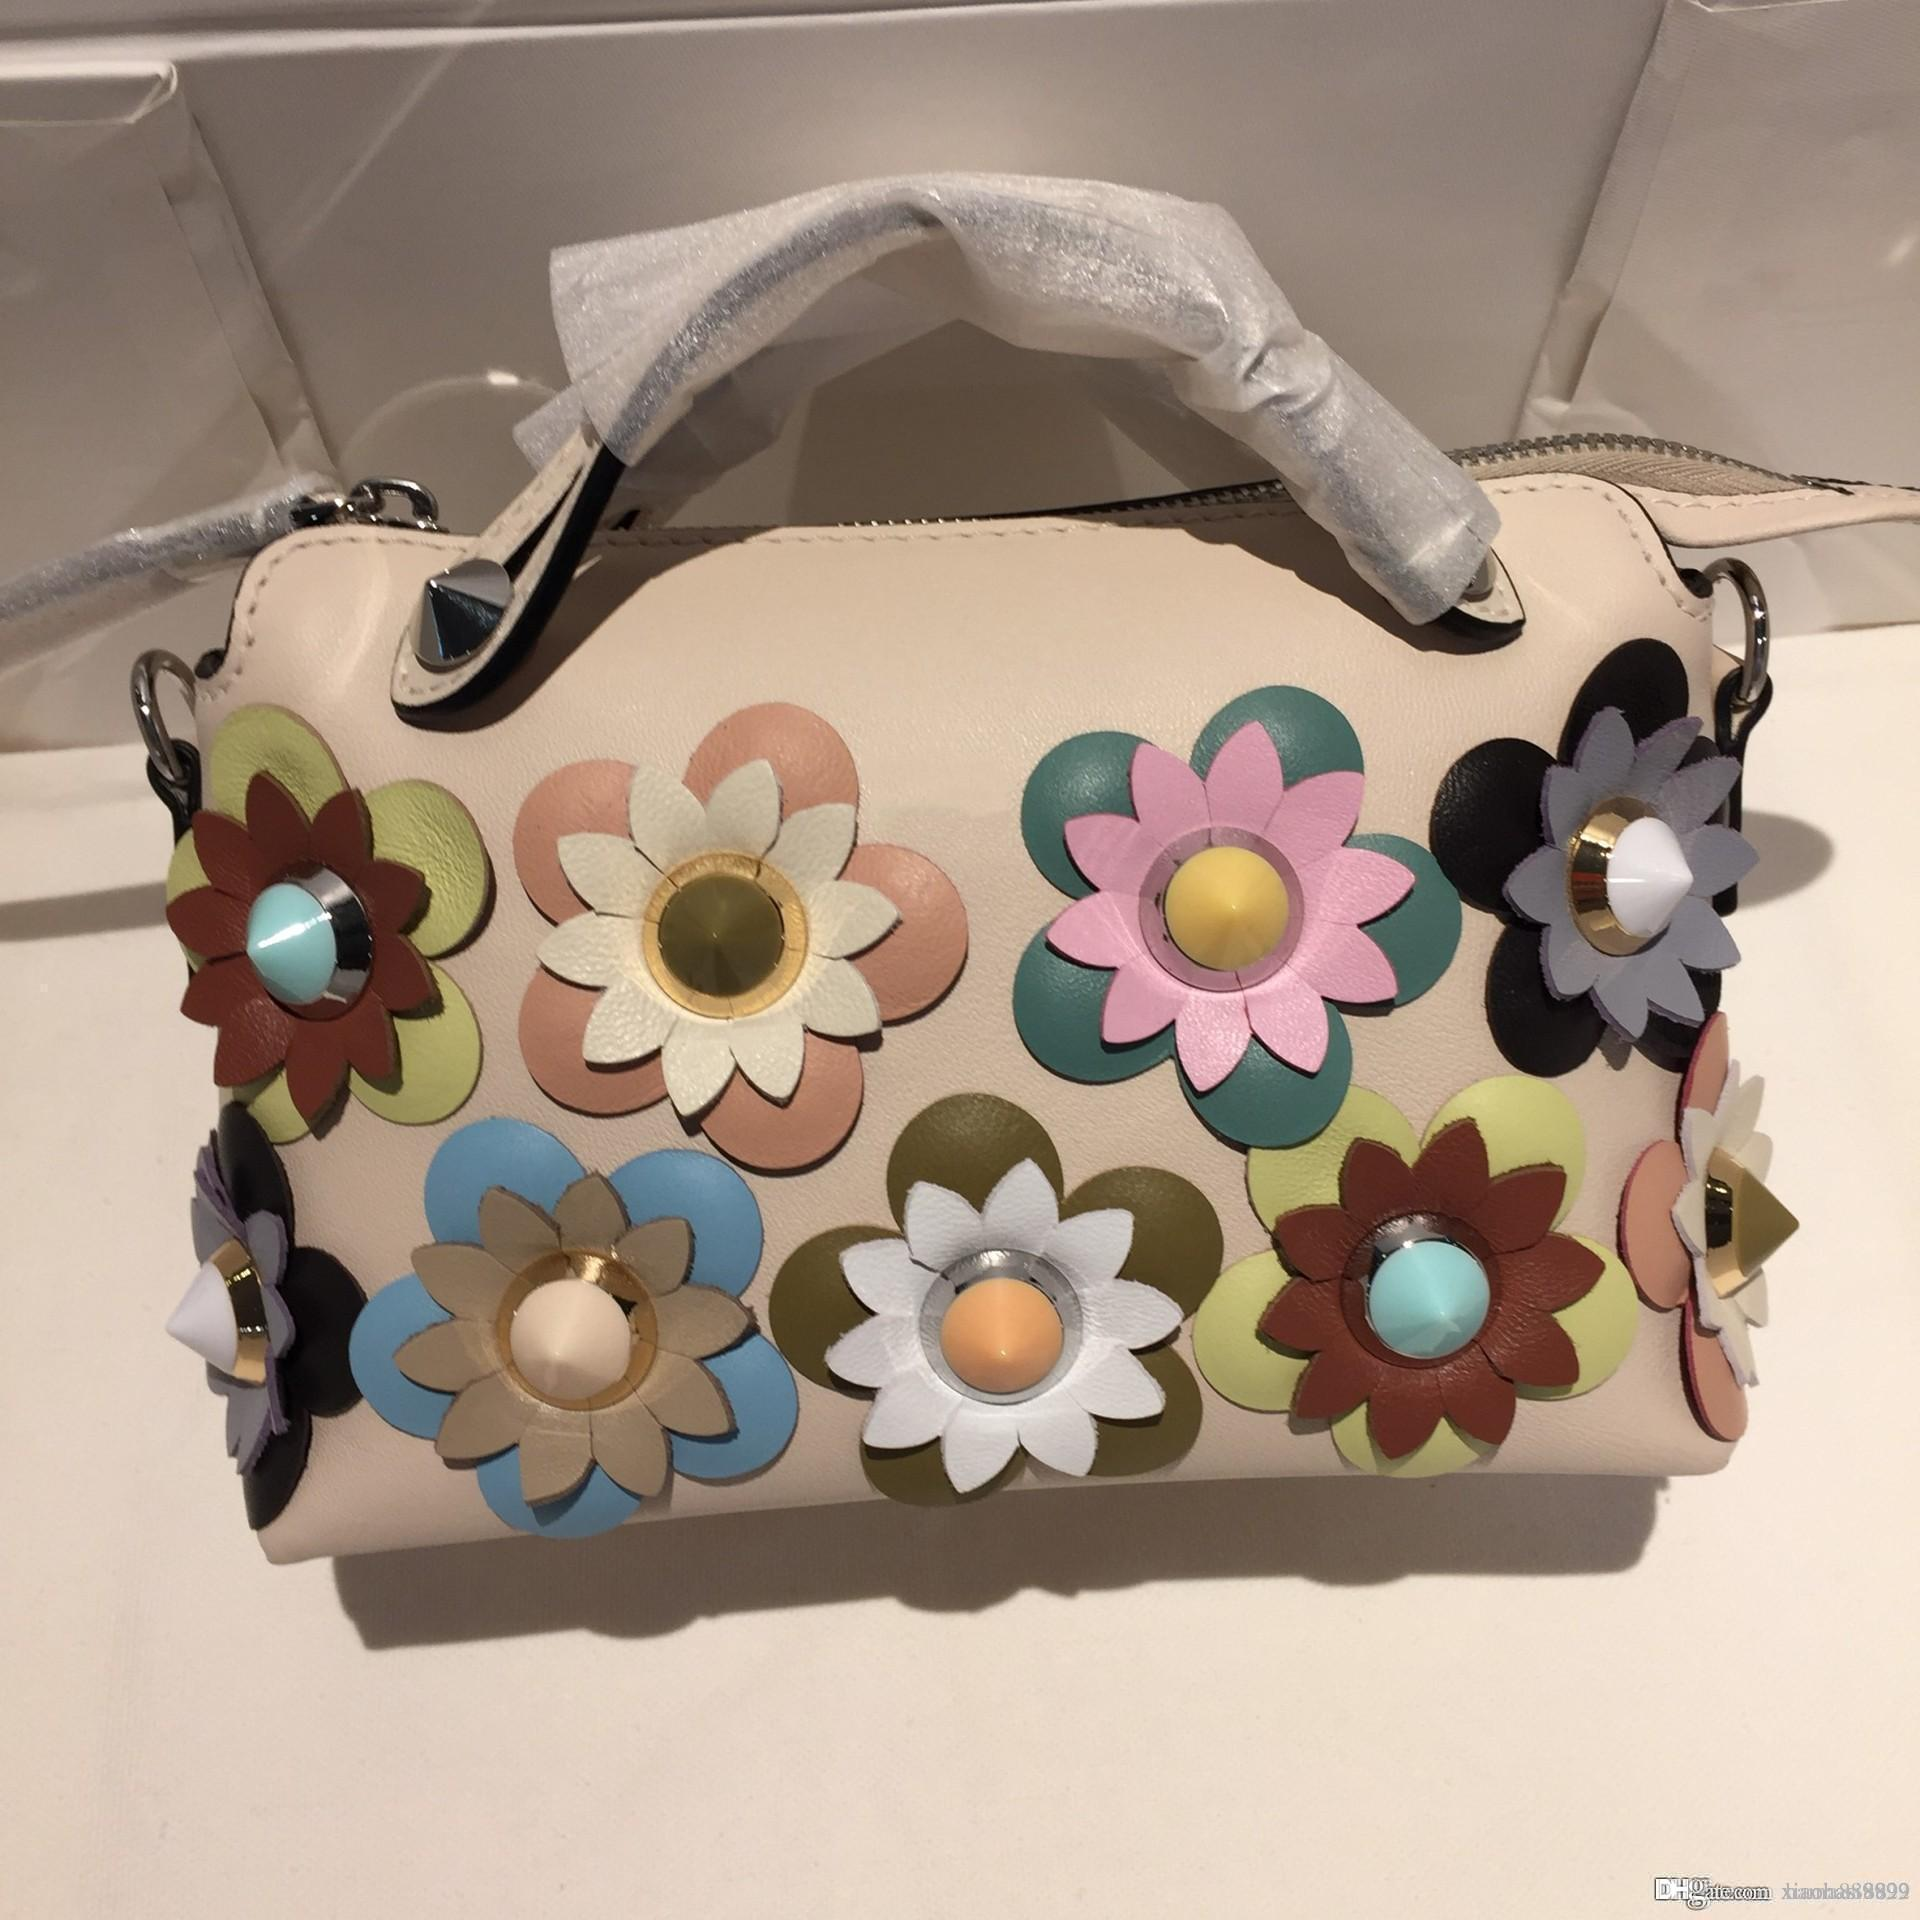 36f025c416e BEST A+Quality by the way flower purses Women Genuine leather handbag  Ladies Hand Bags tote calfskin Messenger Shoulder Crossbody Bag